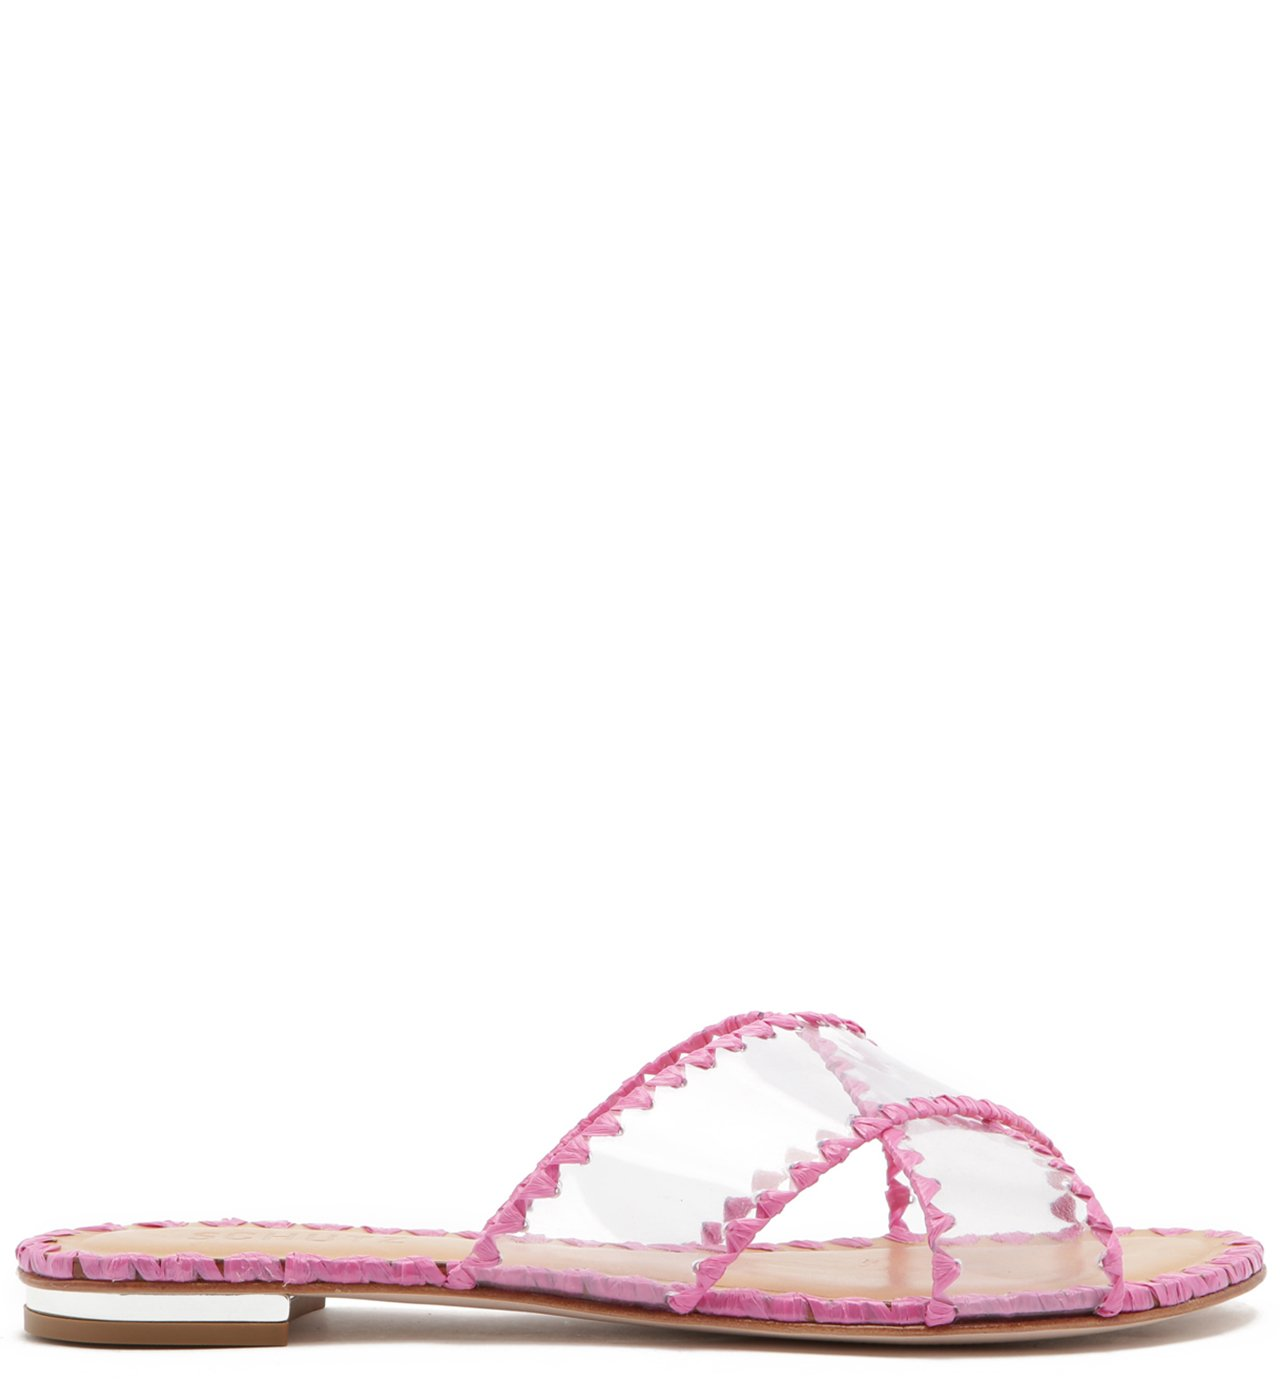 Slide Vinil Crystal Glam Pink | Schutz